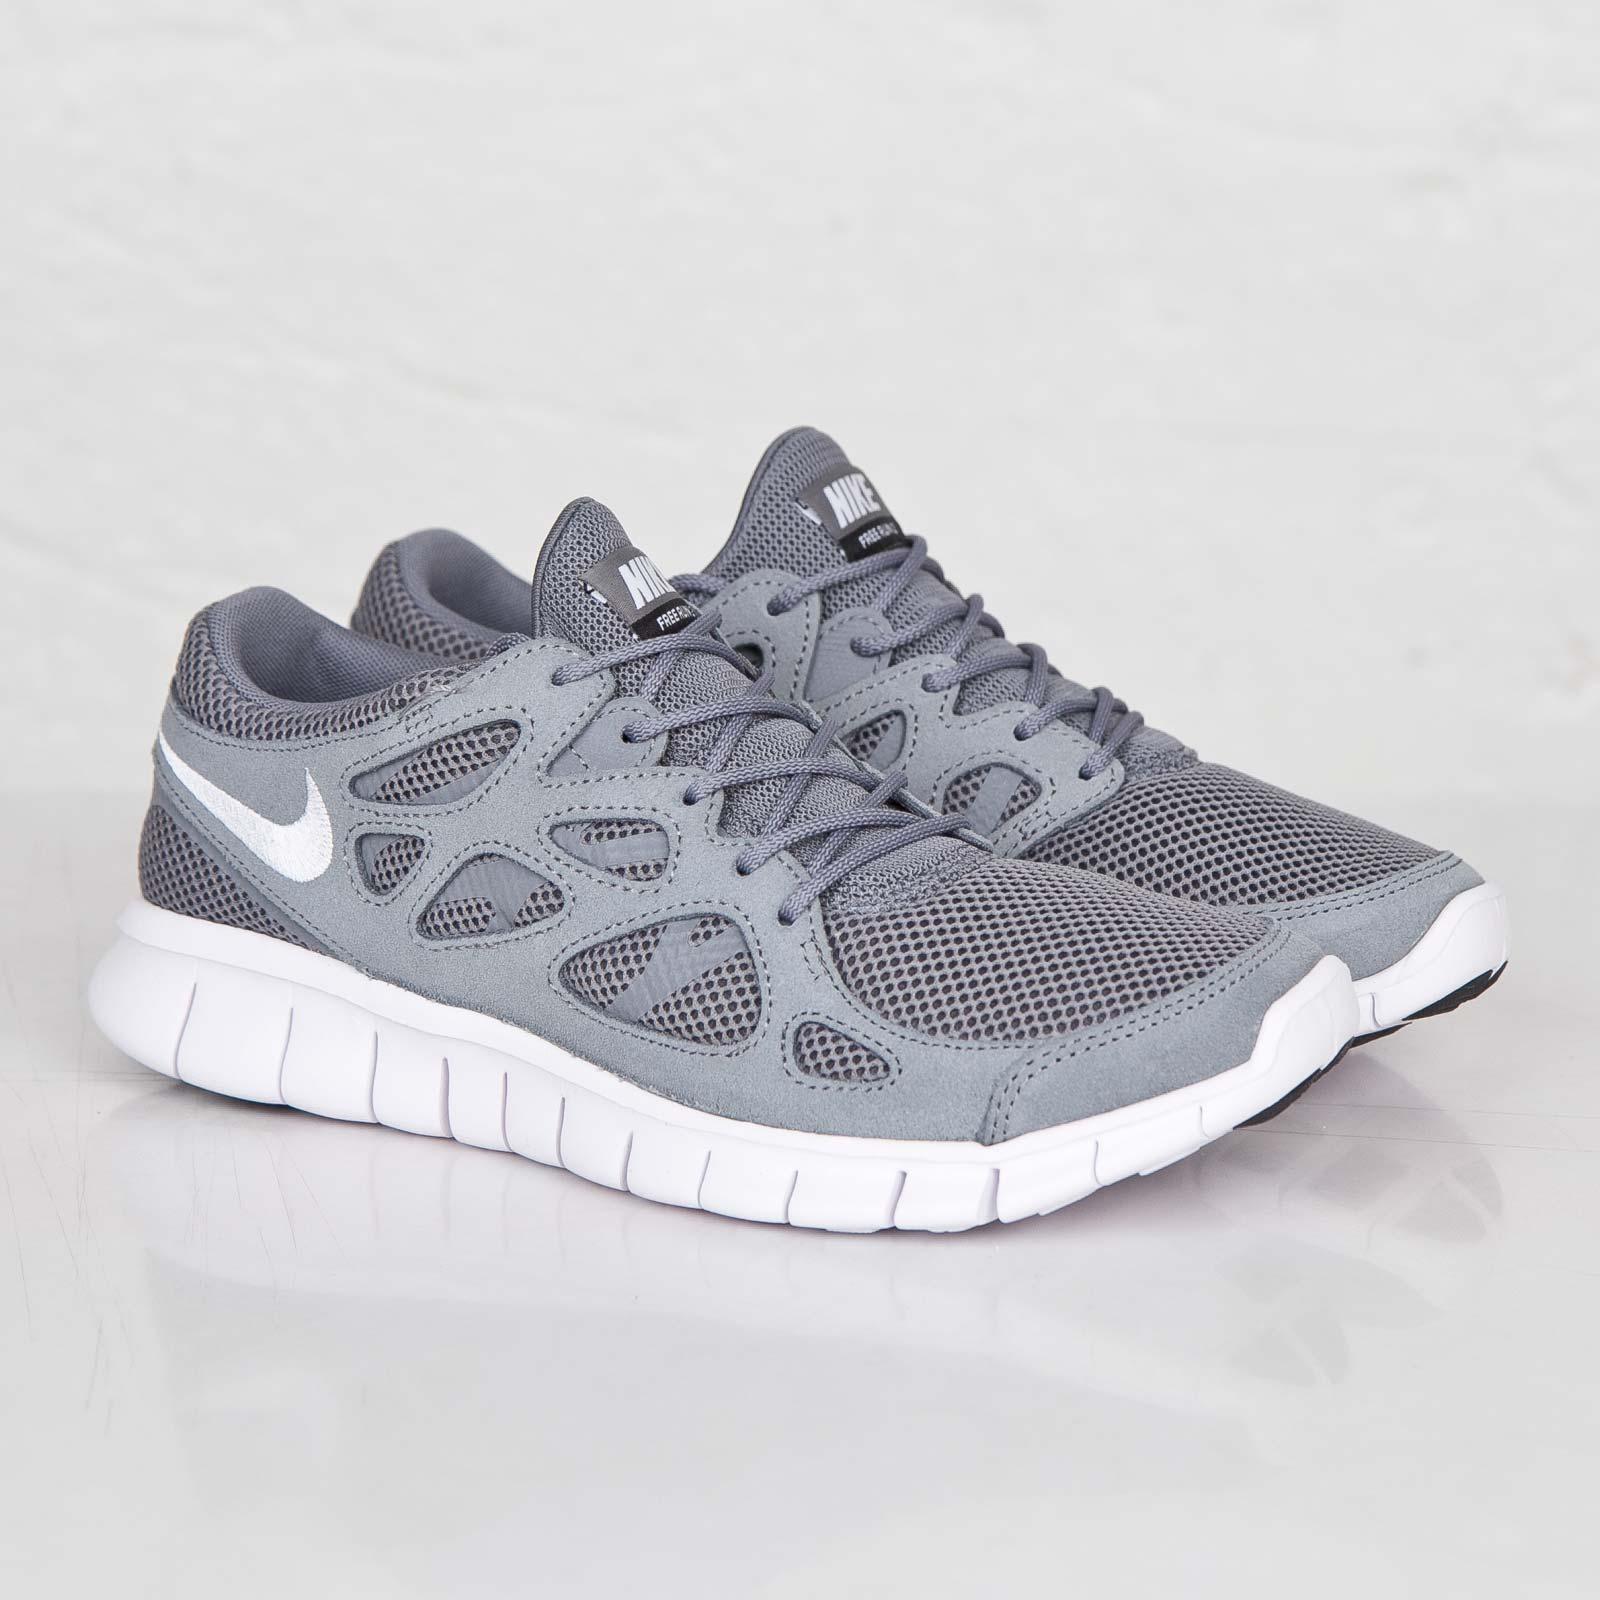 new product b2f46 22274 Nike Free Run 2 - 537732-012 - Sneakersnstuff | sneakers ...